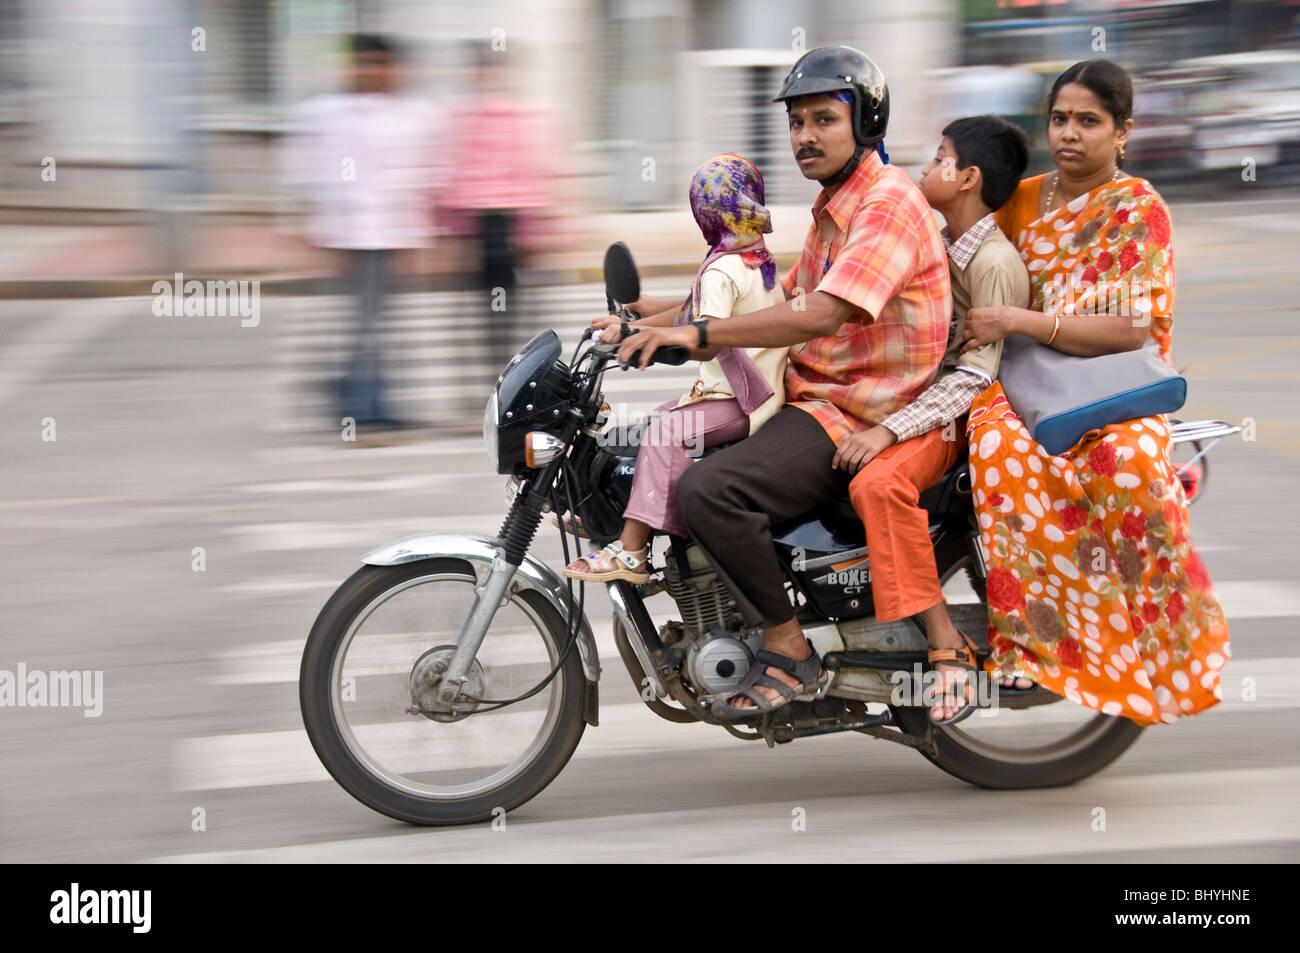 motorcycle family photo  Indian Family On Bike Stock Photos